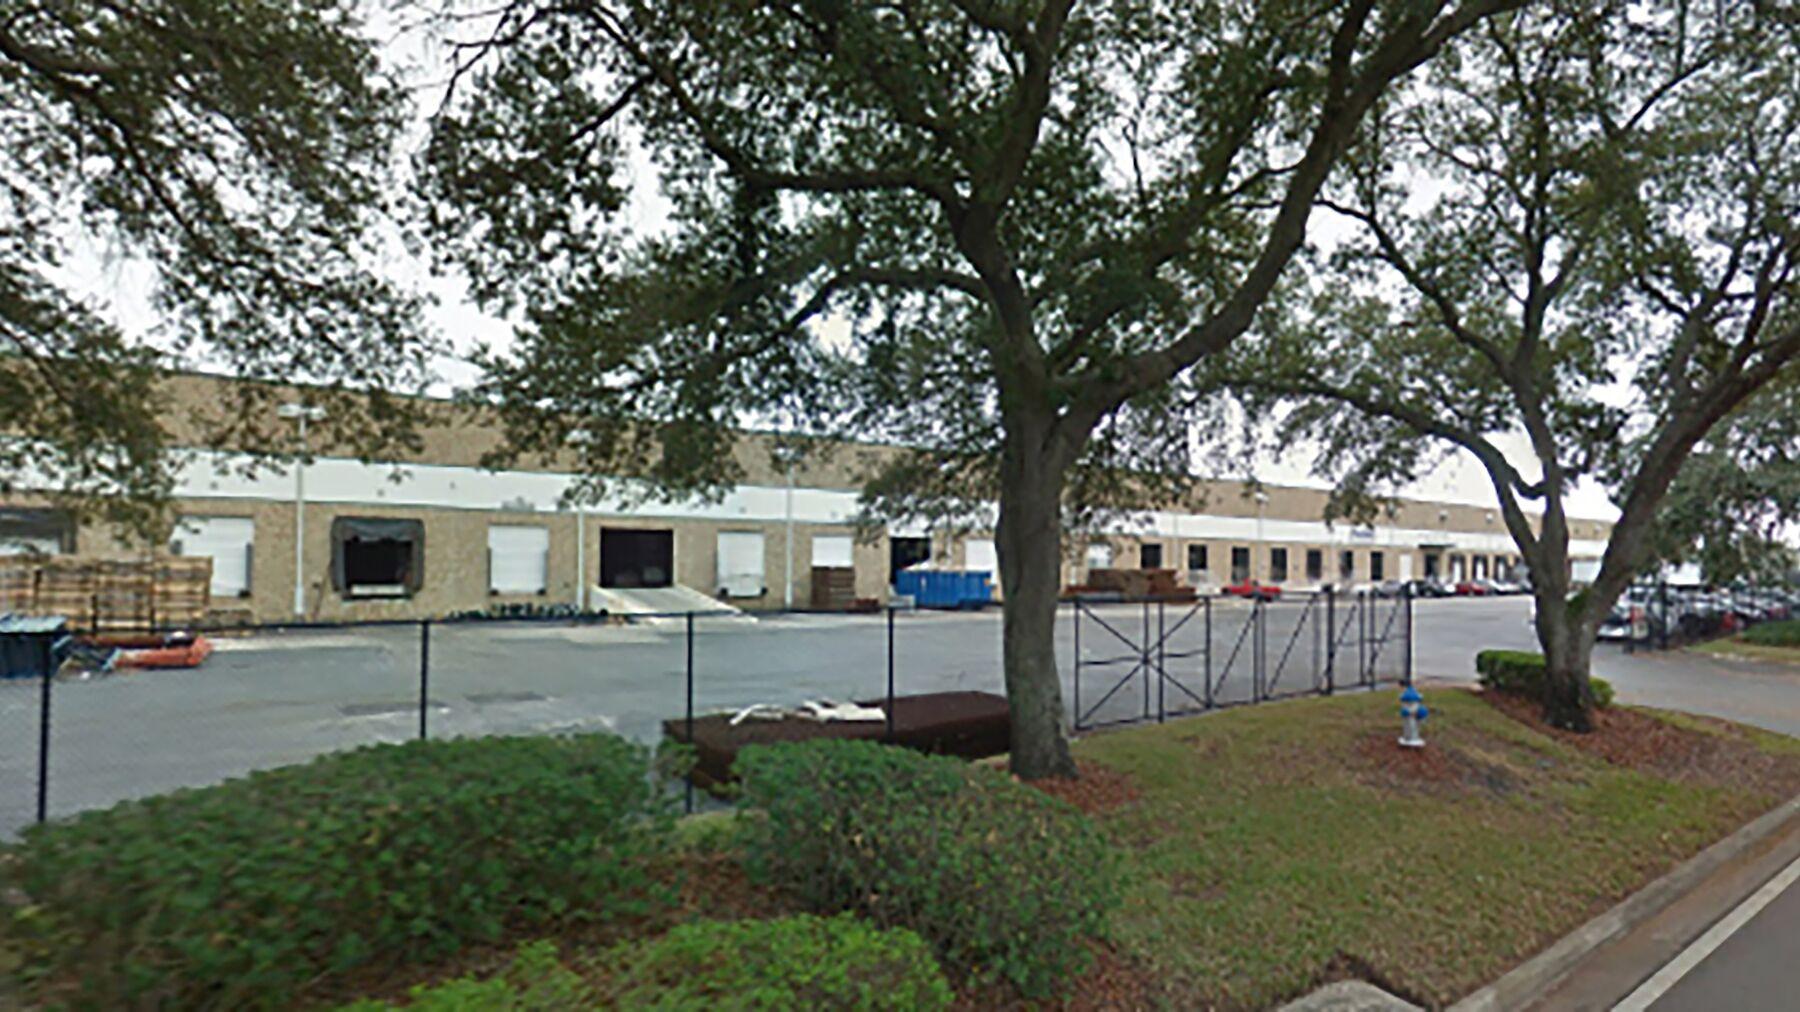 DPM-Orlando-Central-Park-1706_7551-Presidents-Dr.jpg